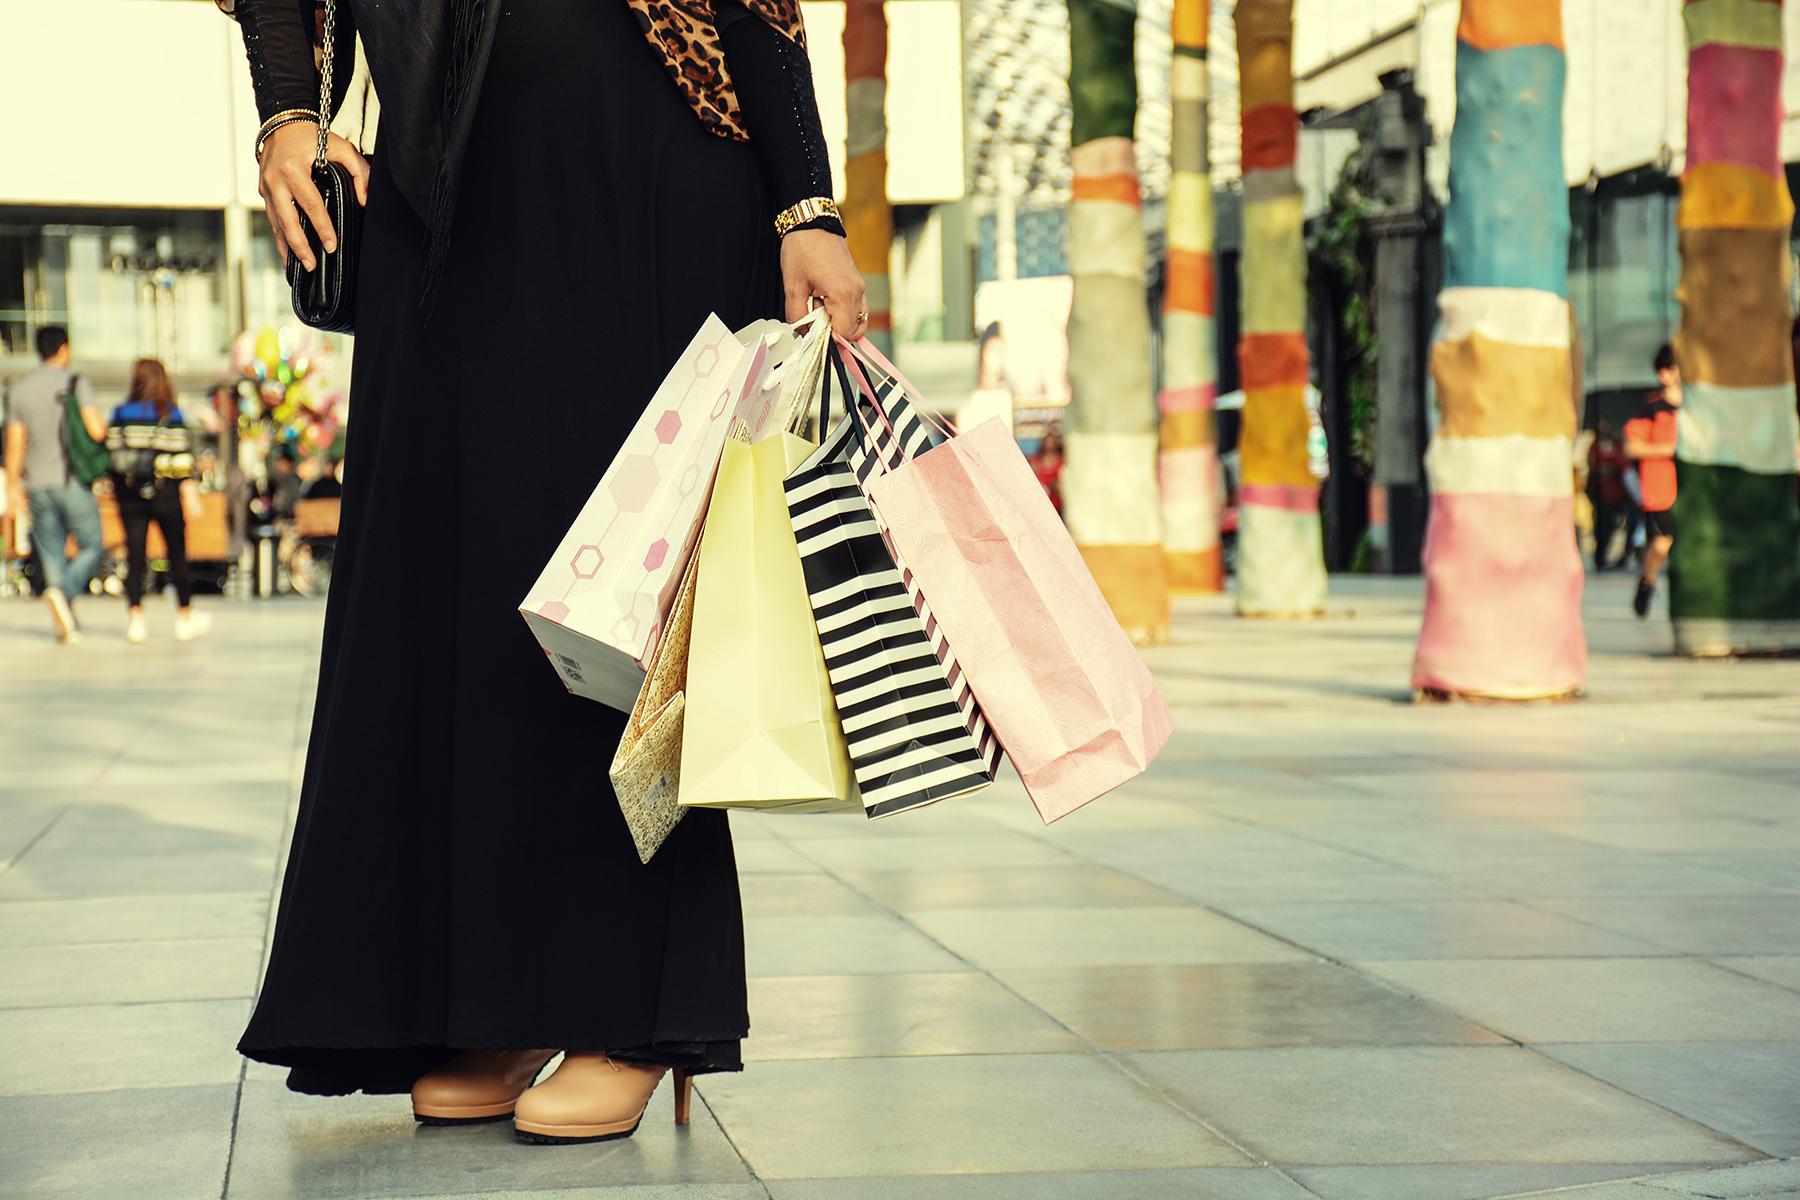 Shopping in Qatar